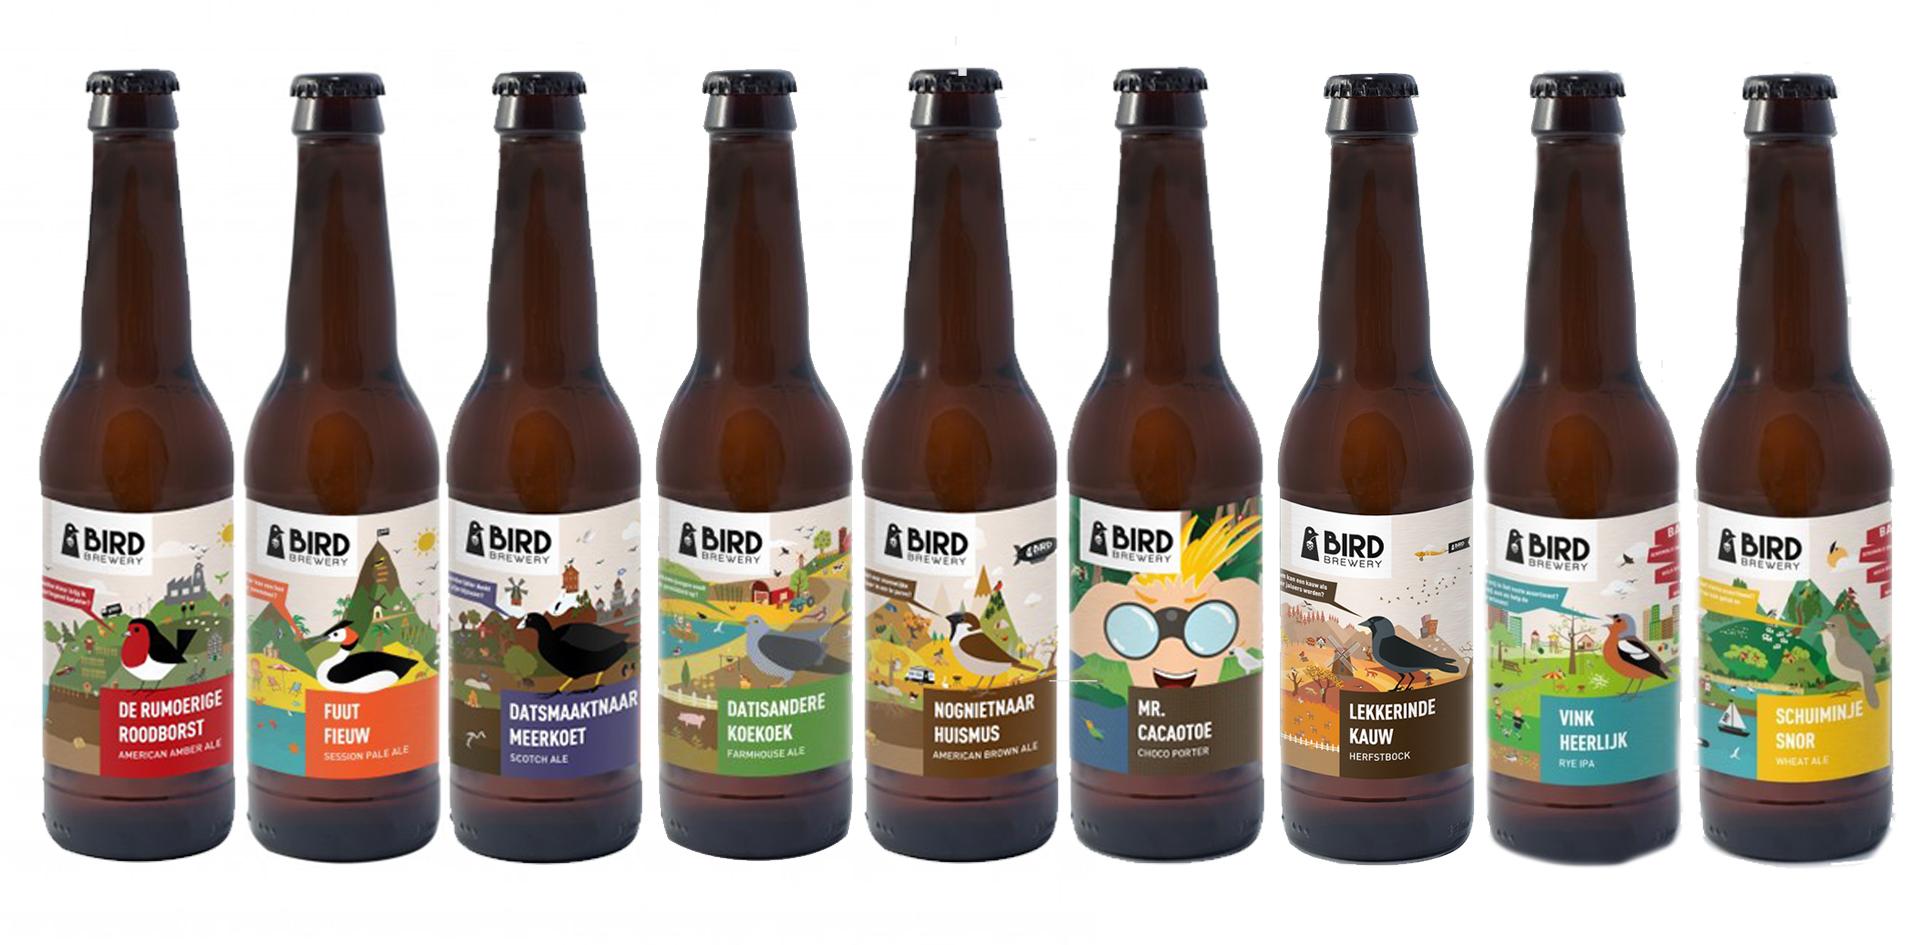 nectar-utrecht-pils-bier-brouwerij-nederland-streekbier-amsterdam-bird-brewery-assortiment